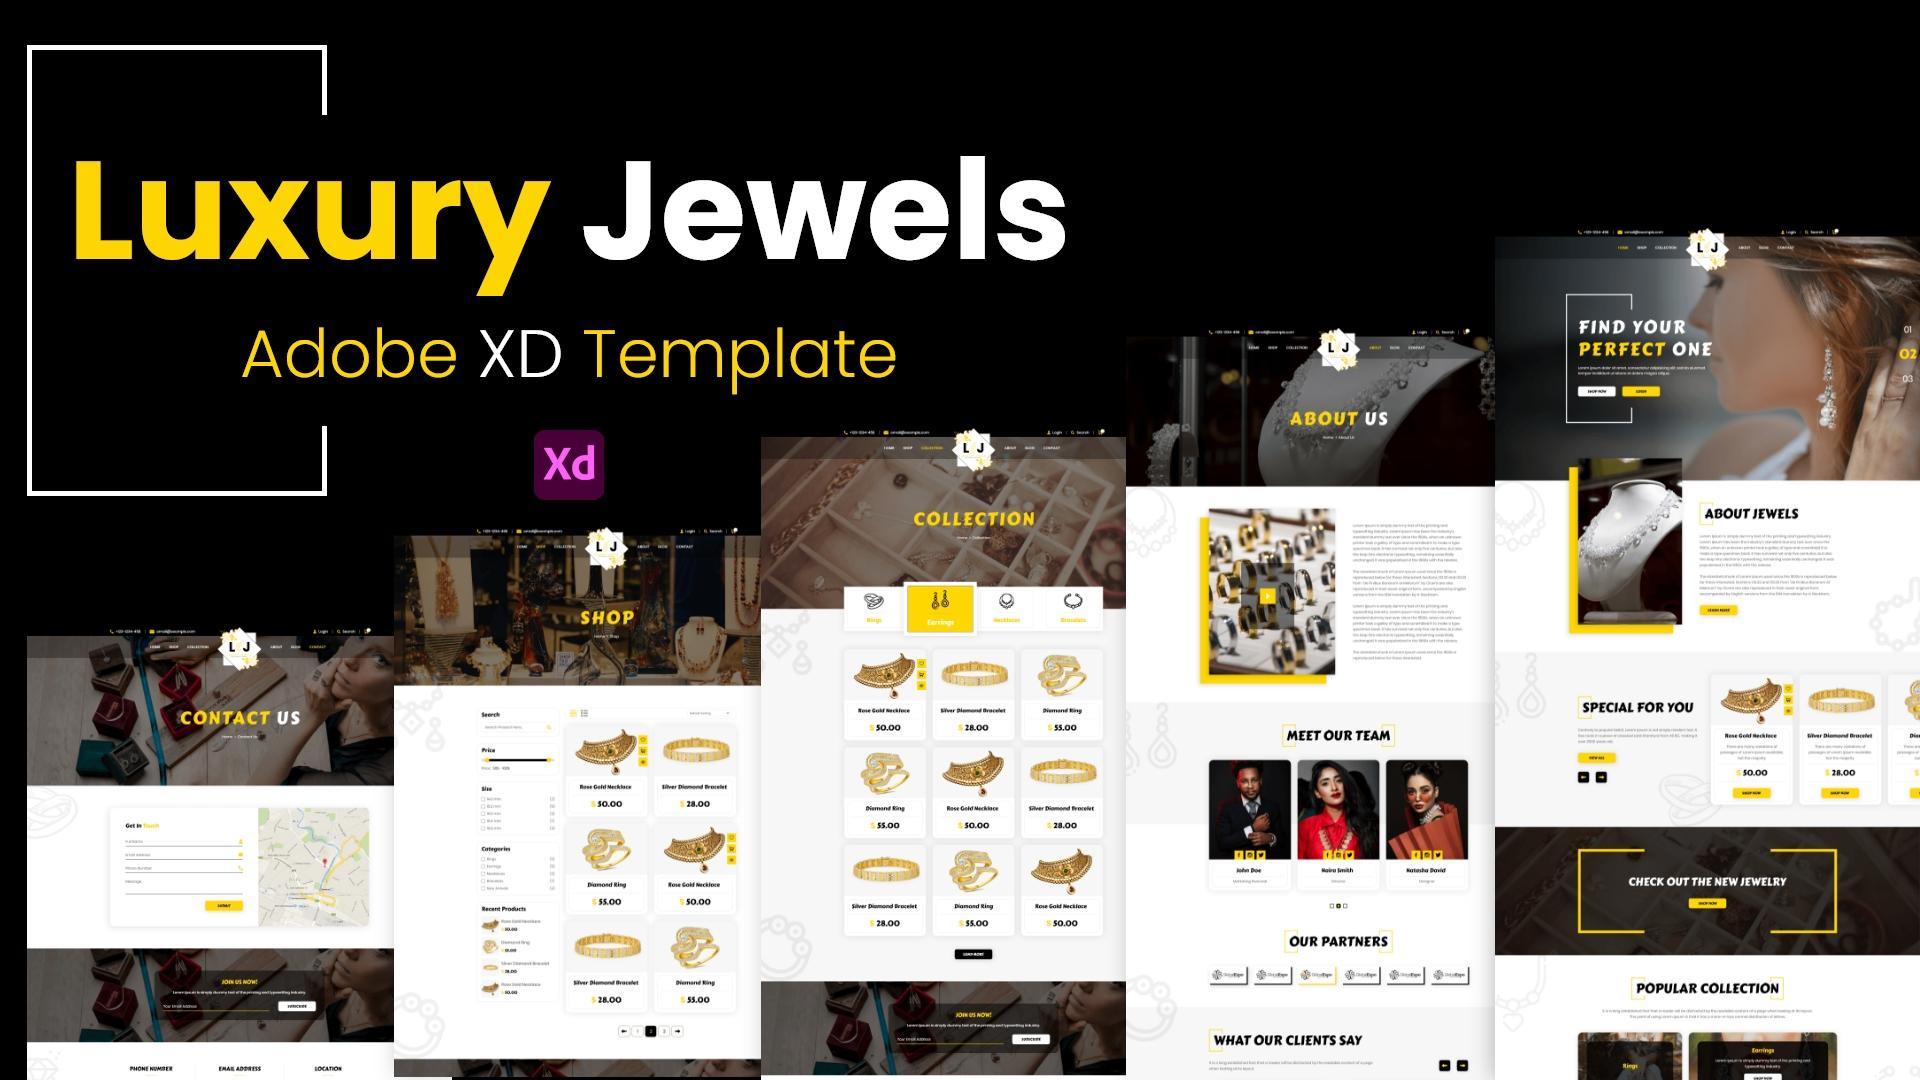 Luxury Jewels – XD Template